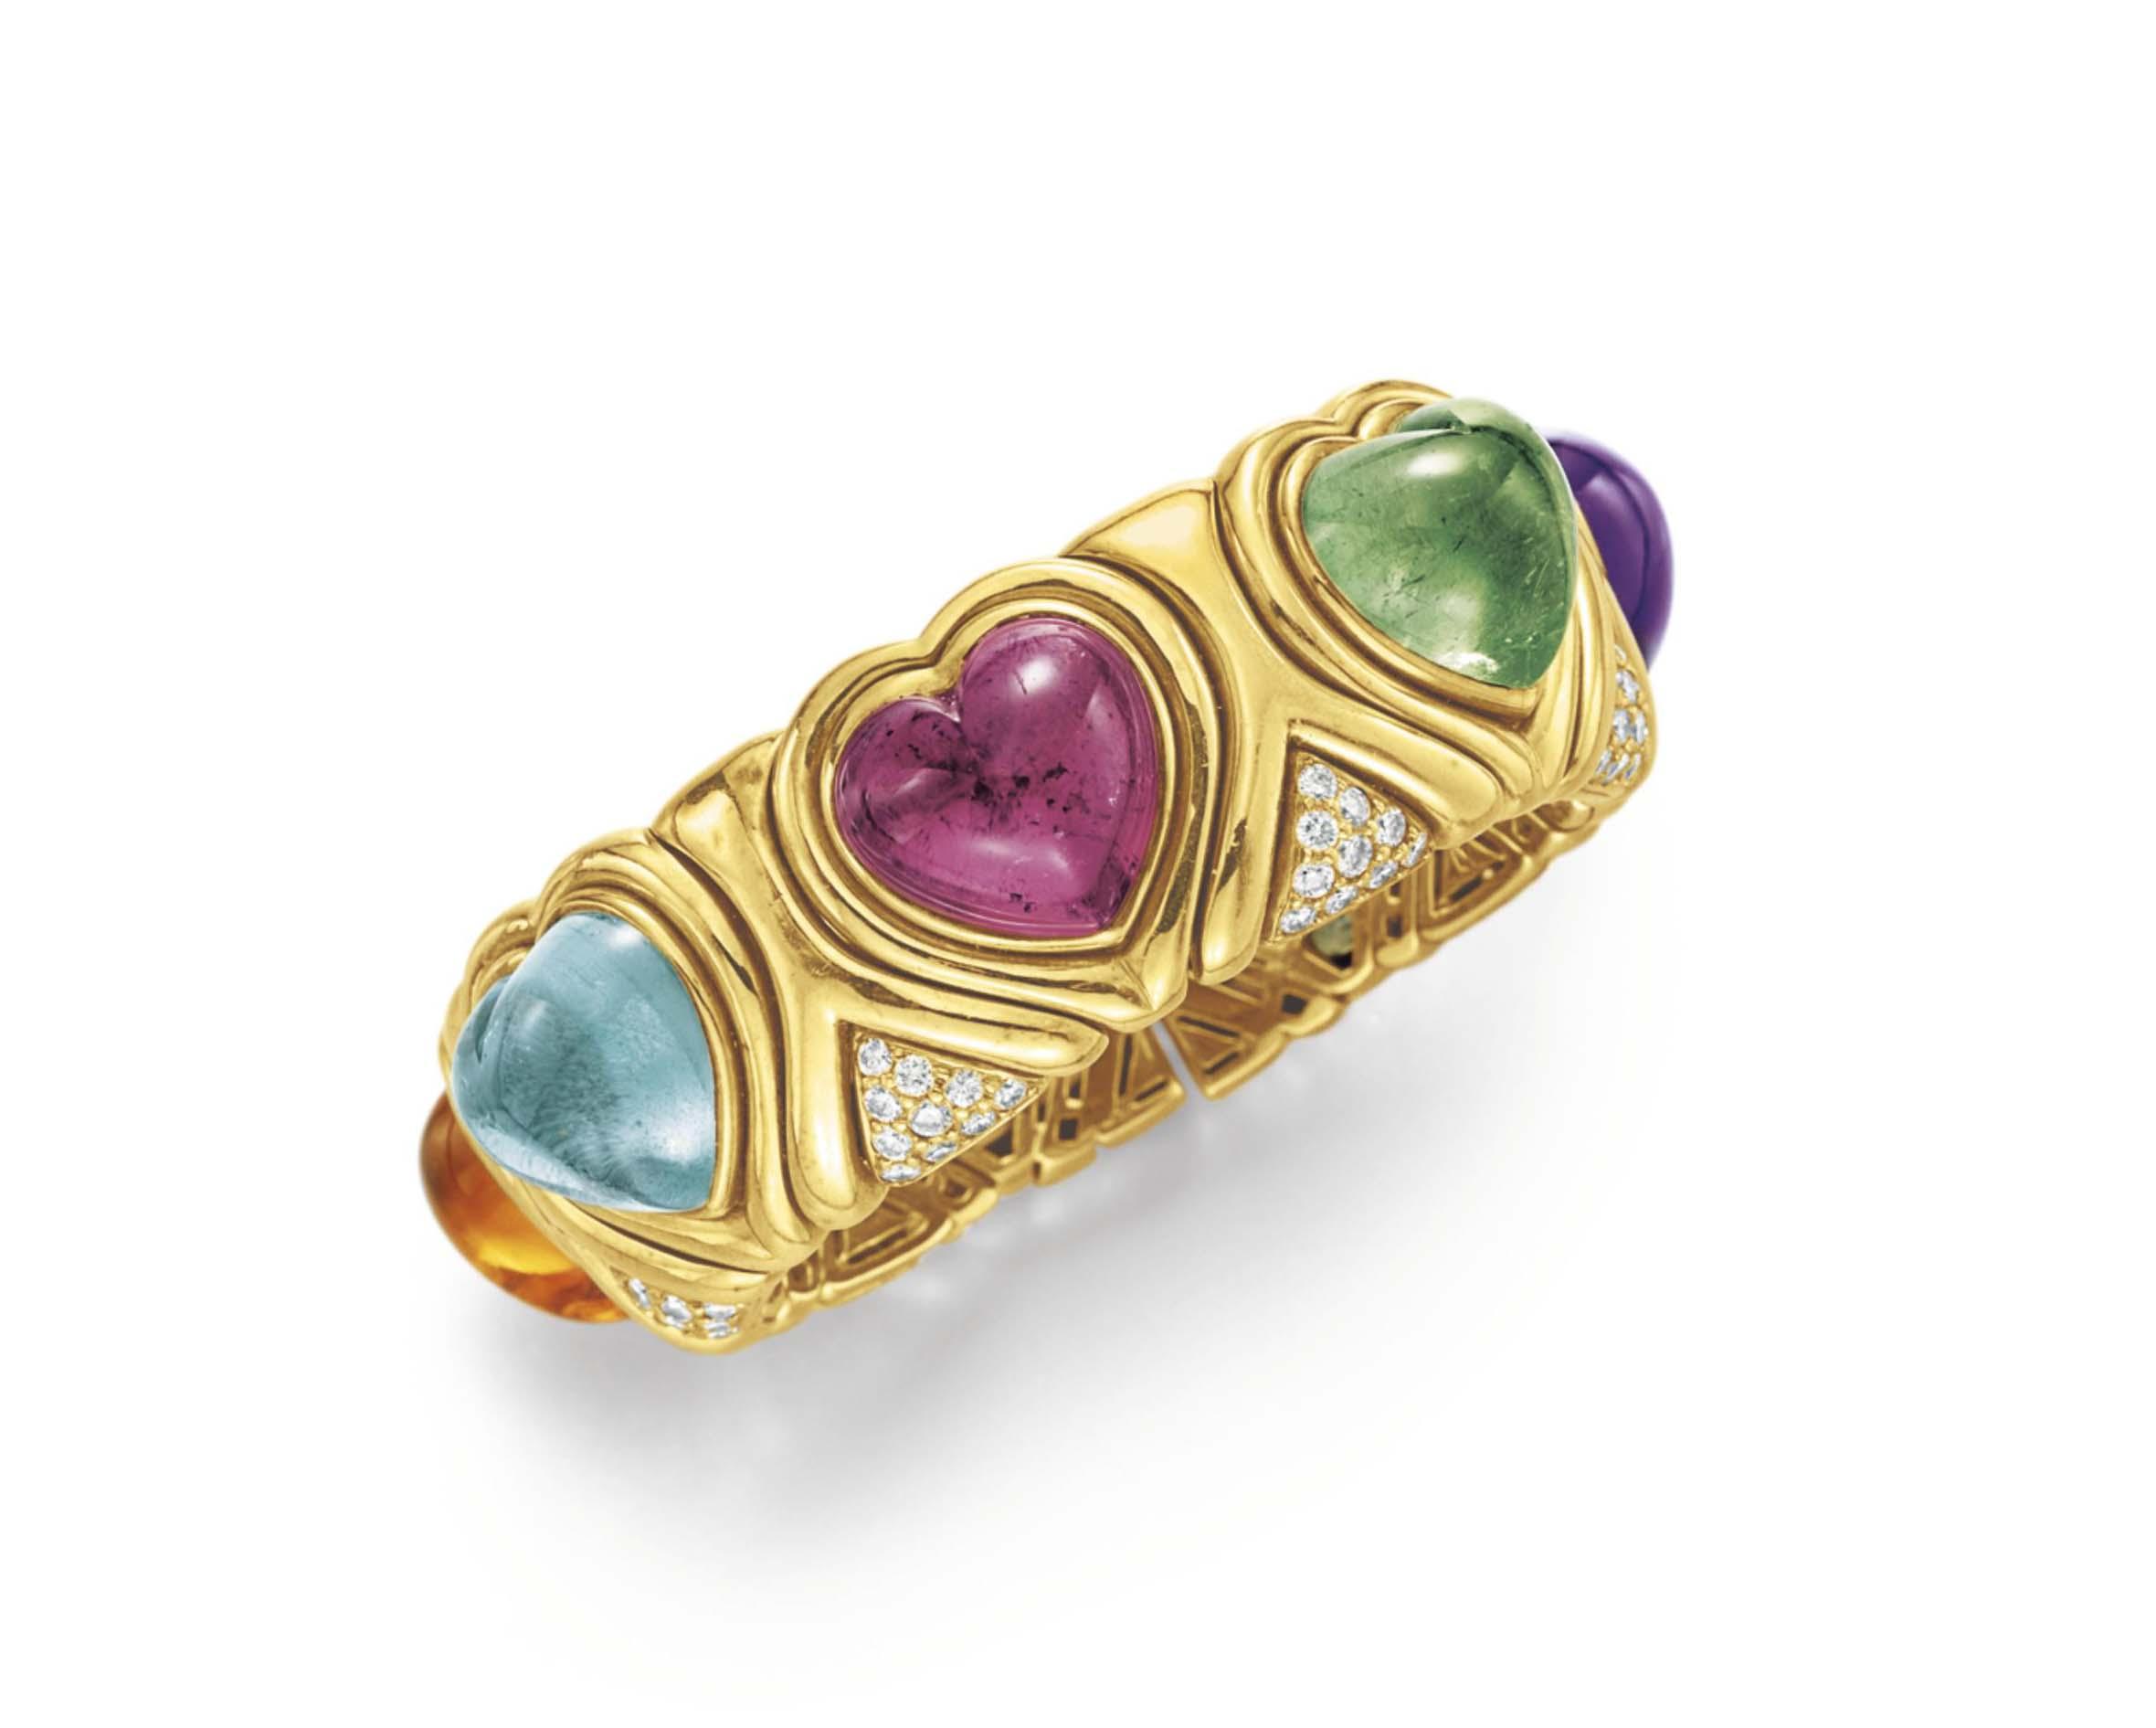 A Diamond Multi Gem And Gold Cuff Bracelet By Bvlgari